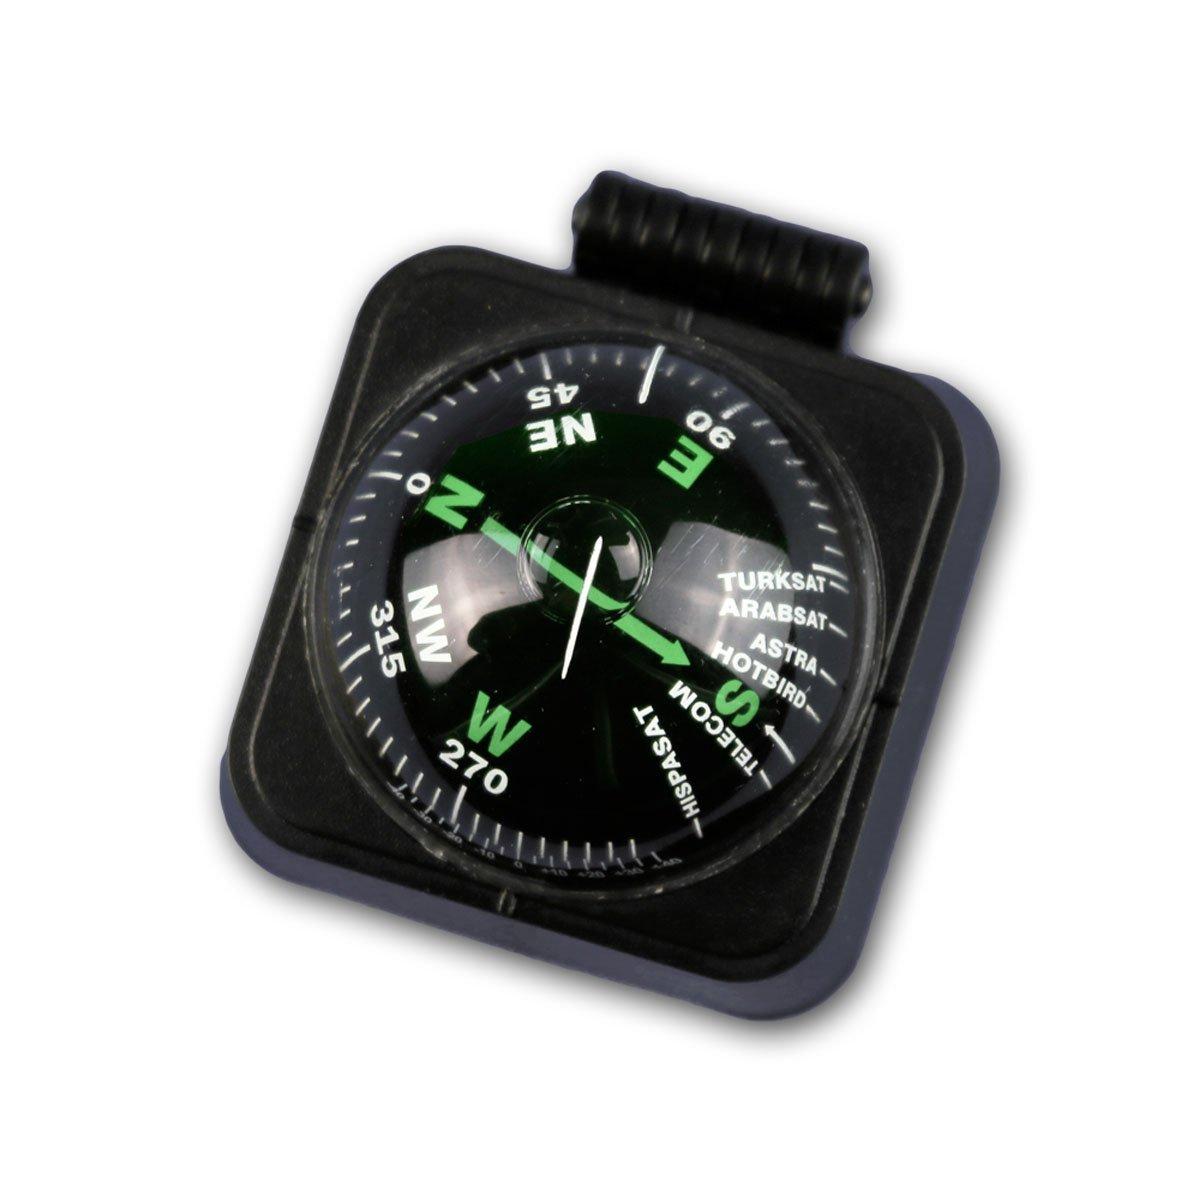 Satellitenschüssel Ausrichten Kompass